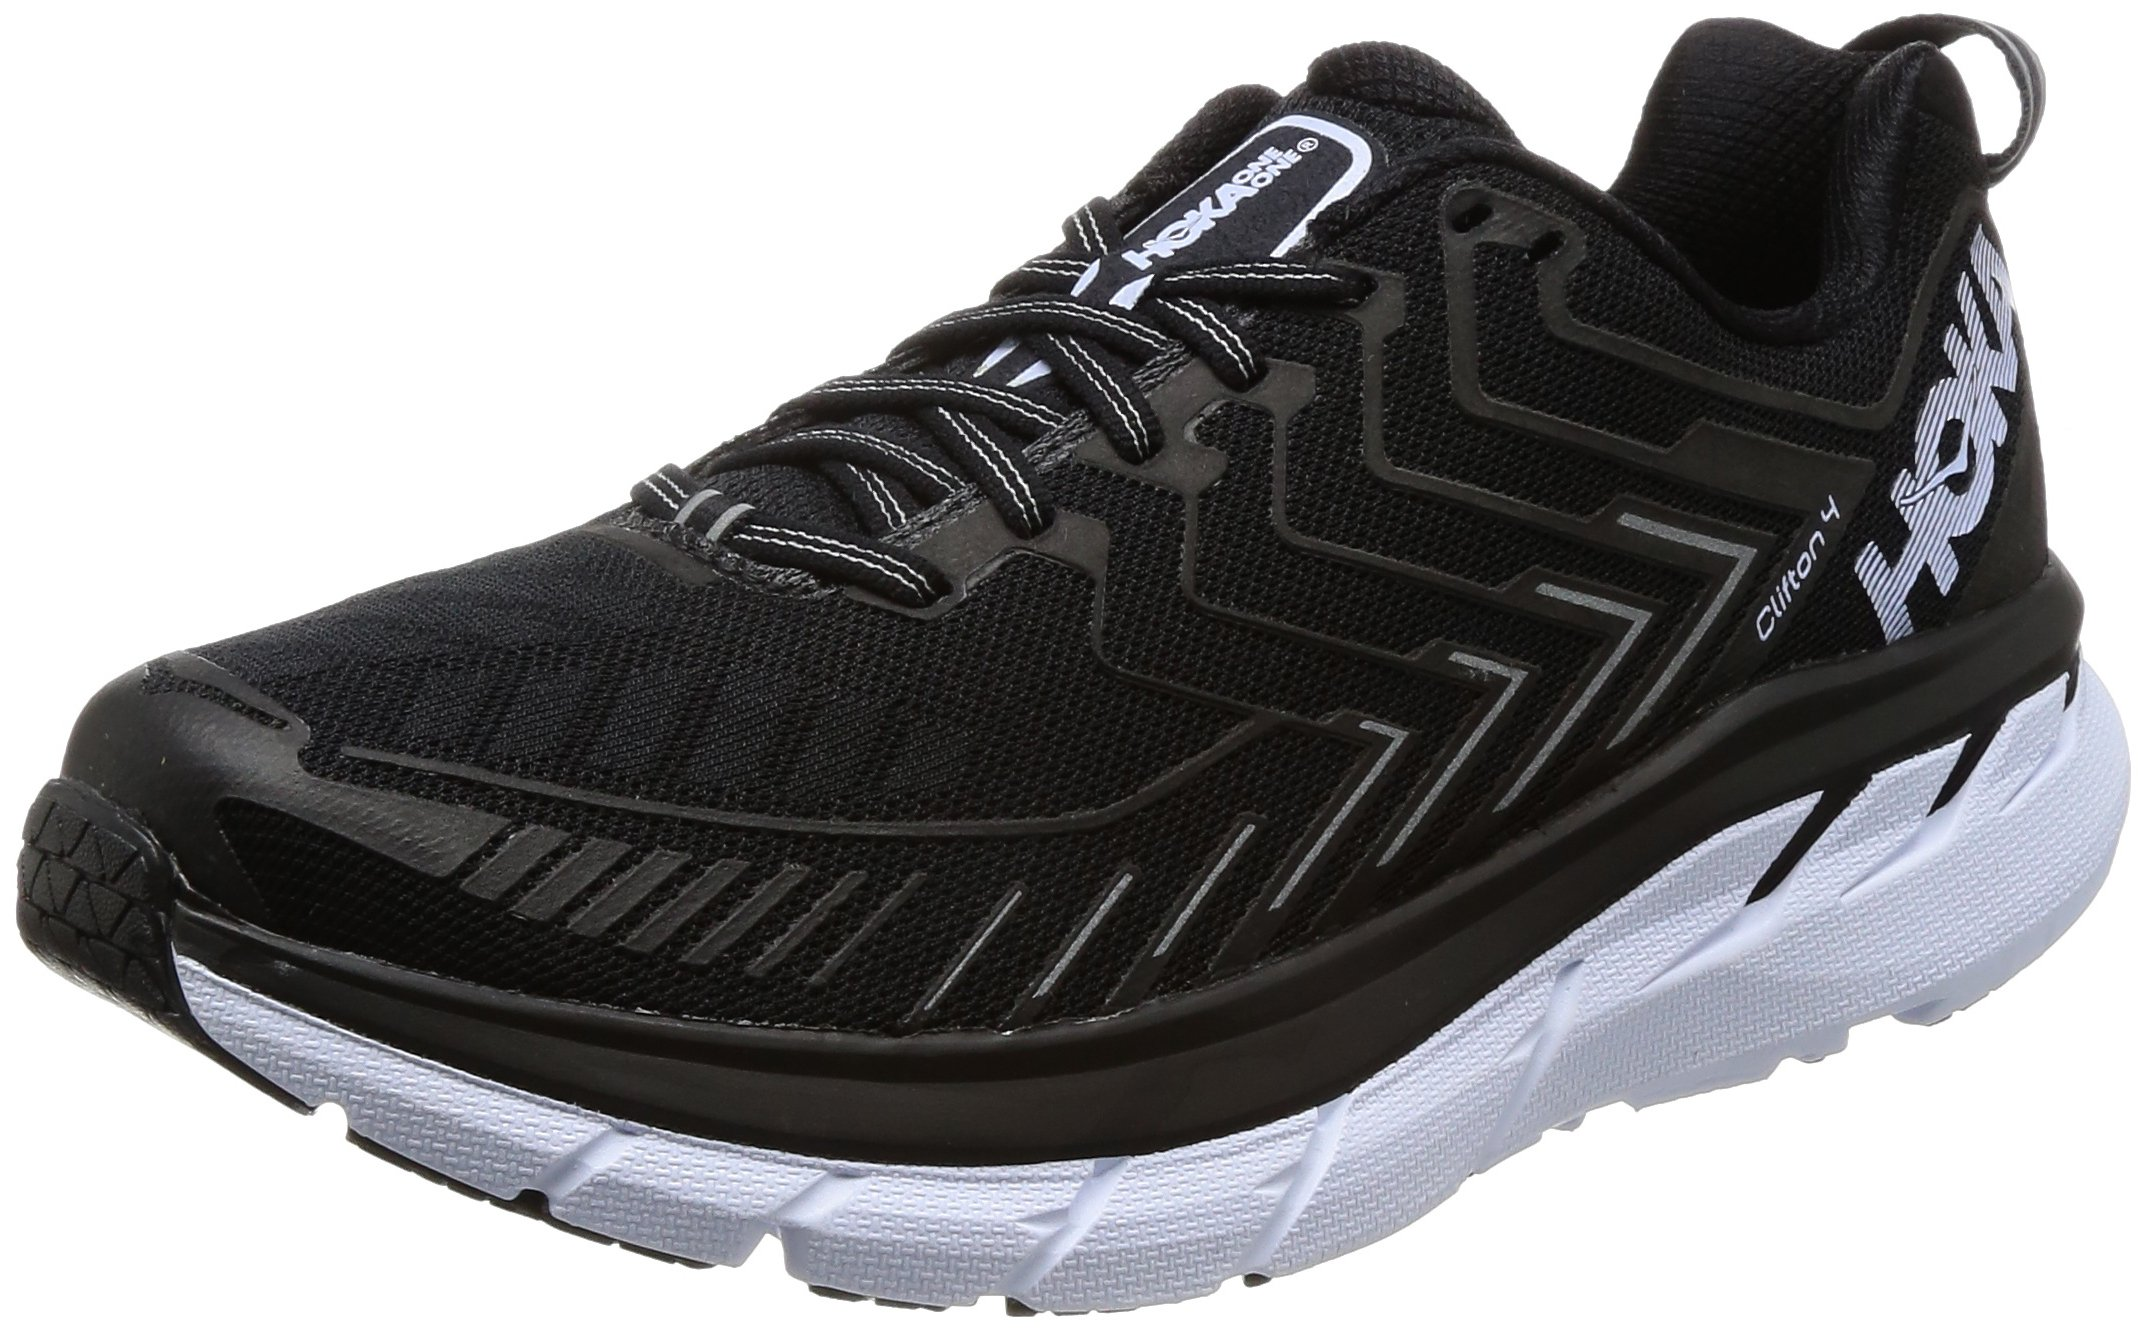 HOKA ONE ONE Clifton 4 Shoes Running Shoes - Men's Black/White 8 by HOKA ONE ONE